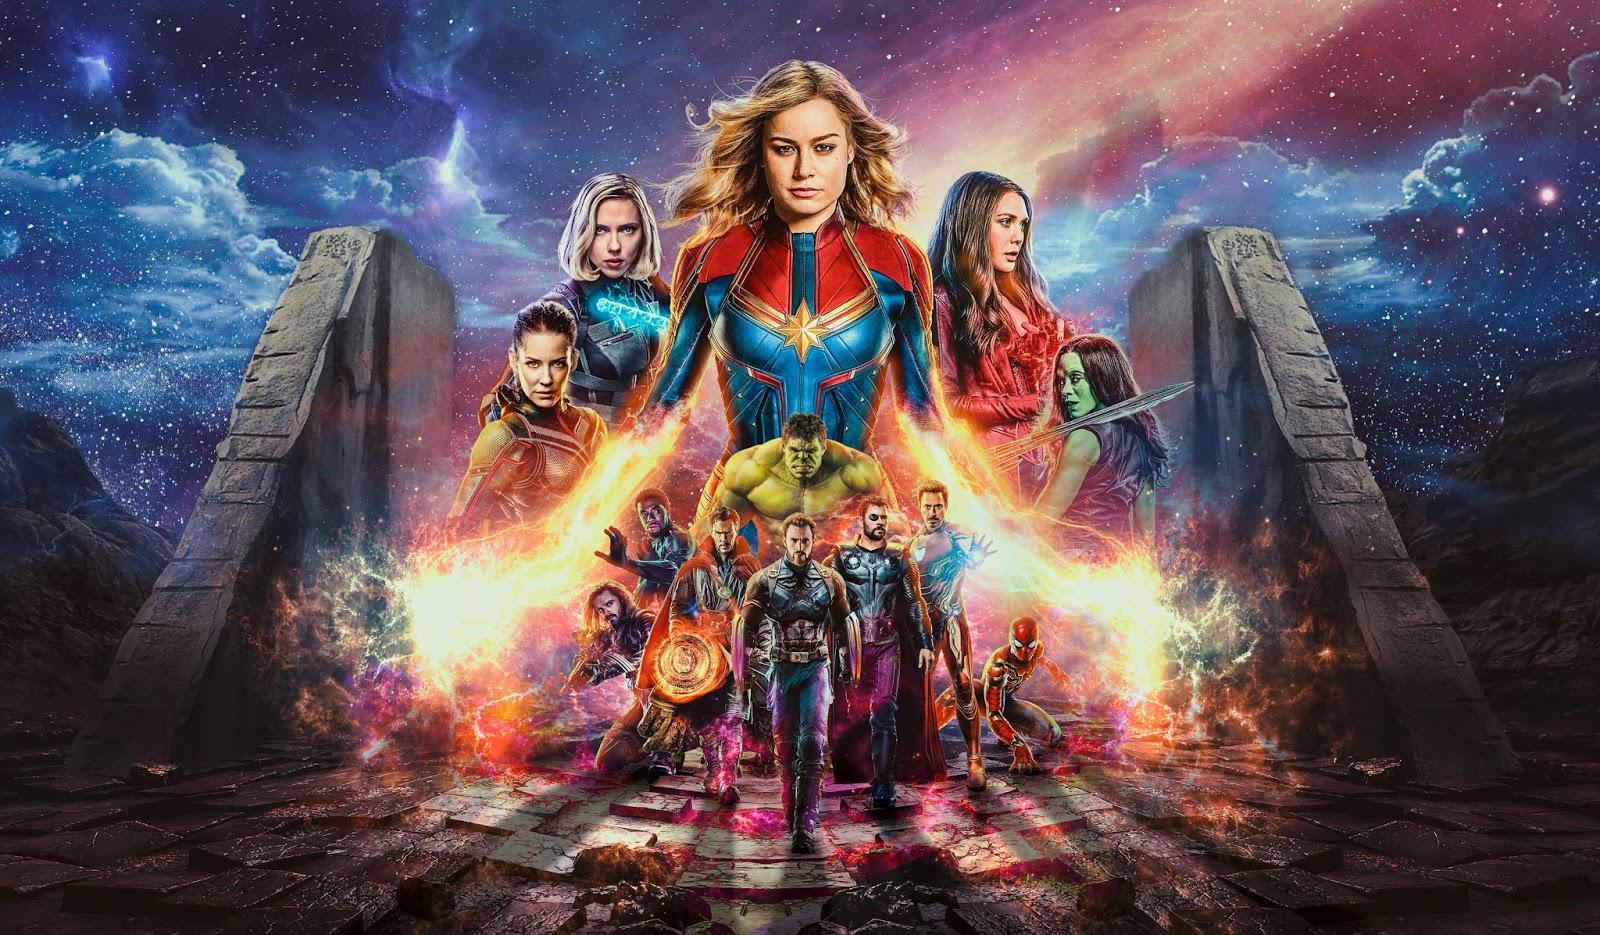 FILM AVENGERS: Jentikan Jari Tangan Thanos Lenyapkan Indeks Pencarian Google